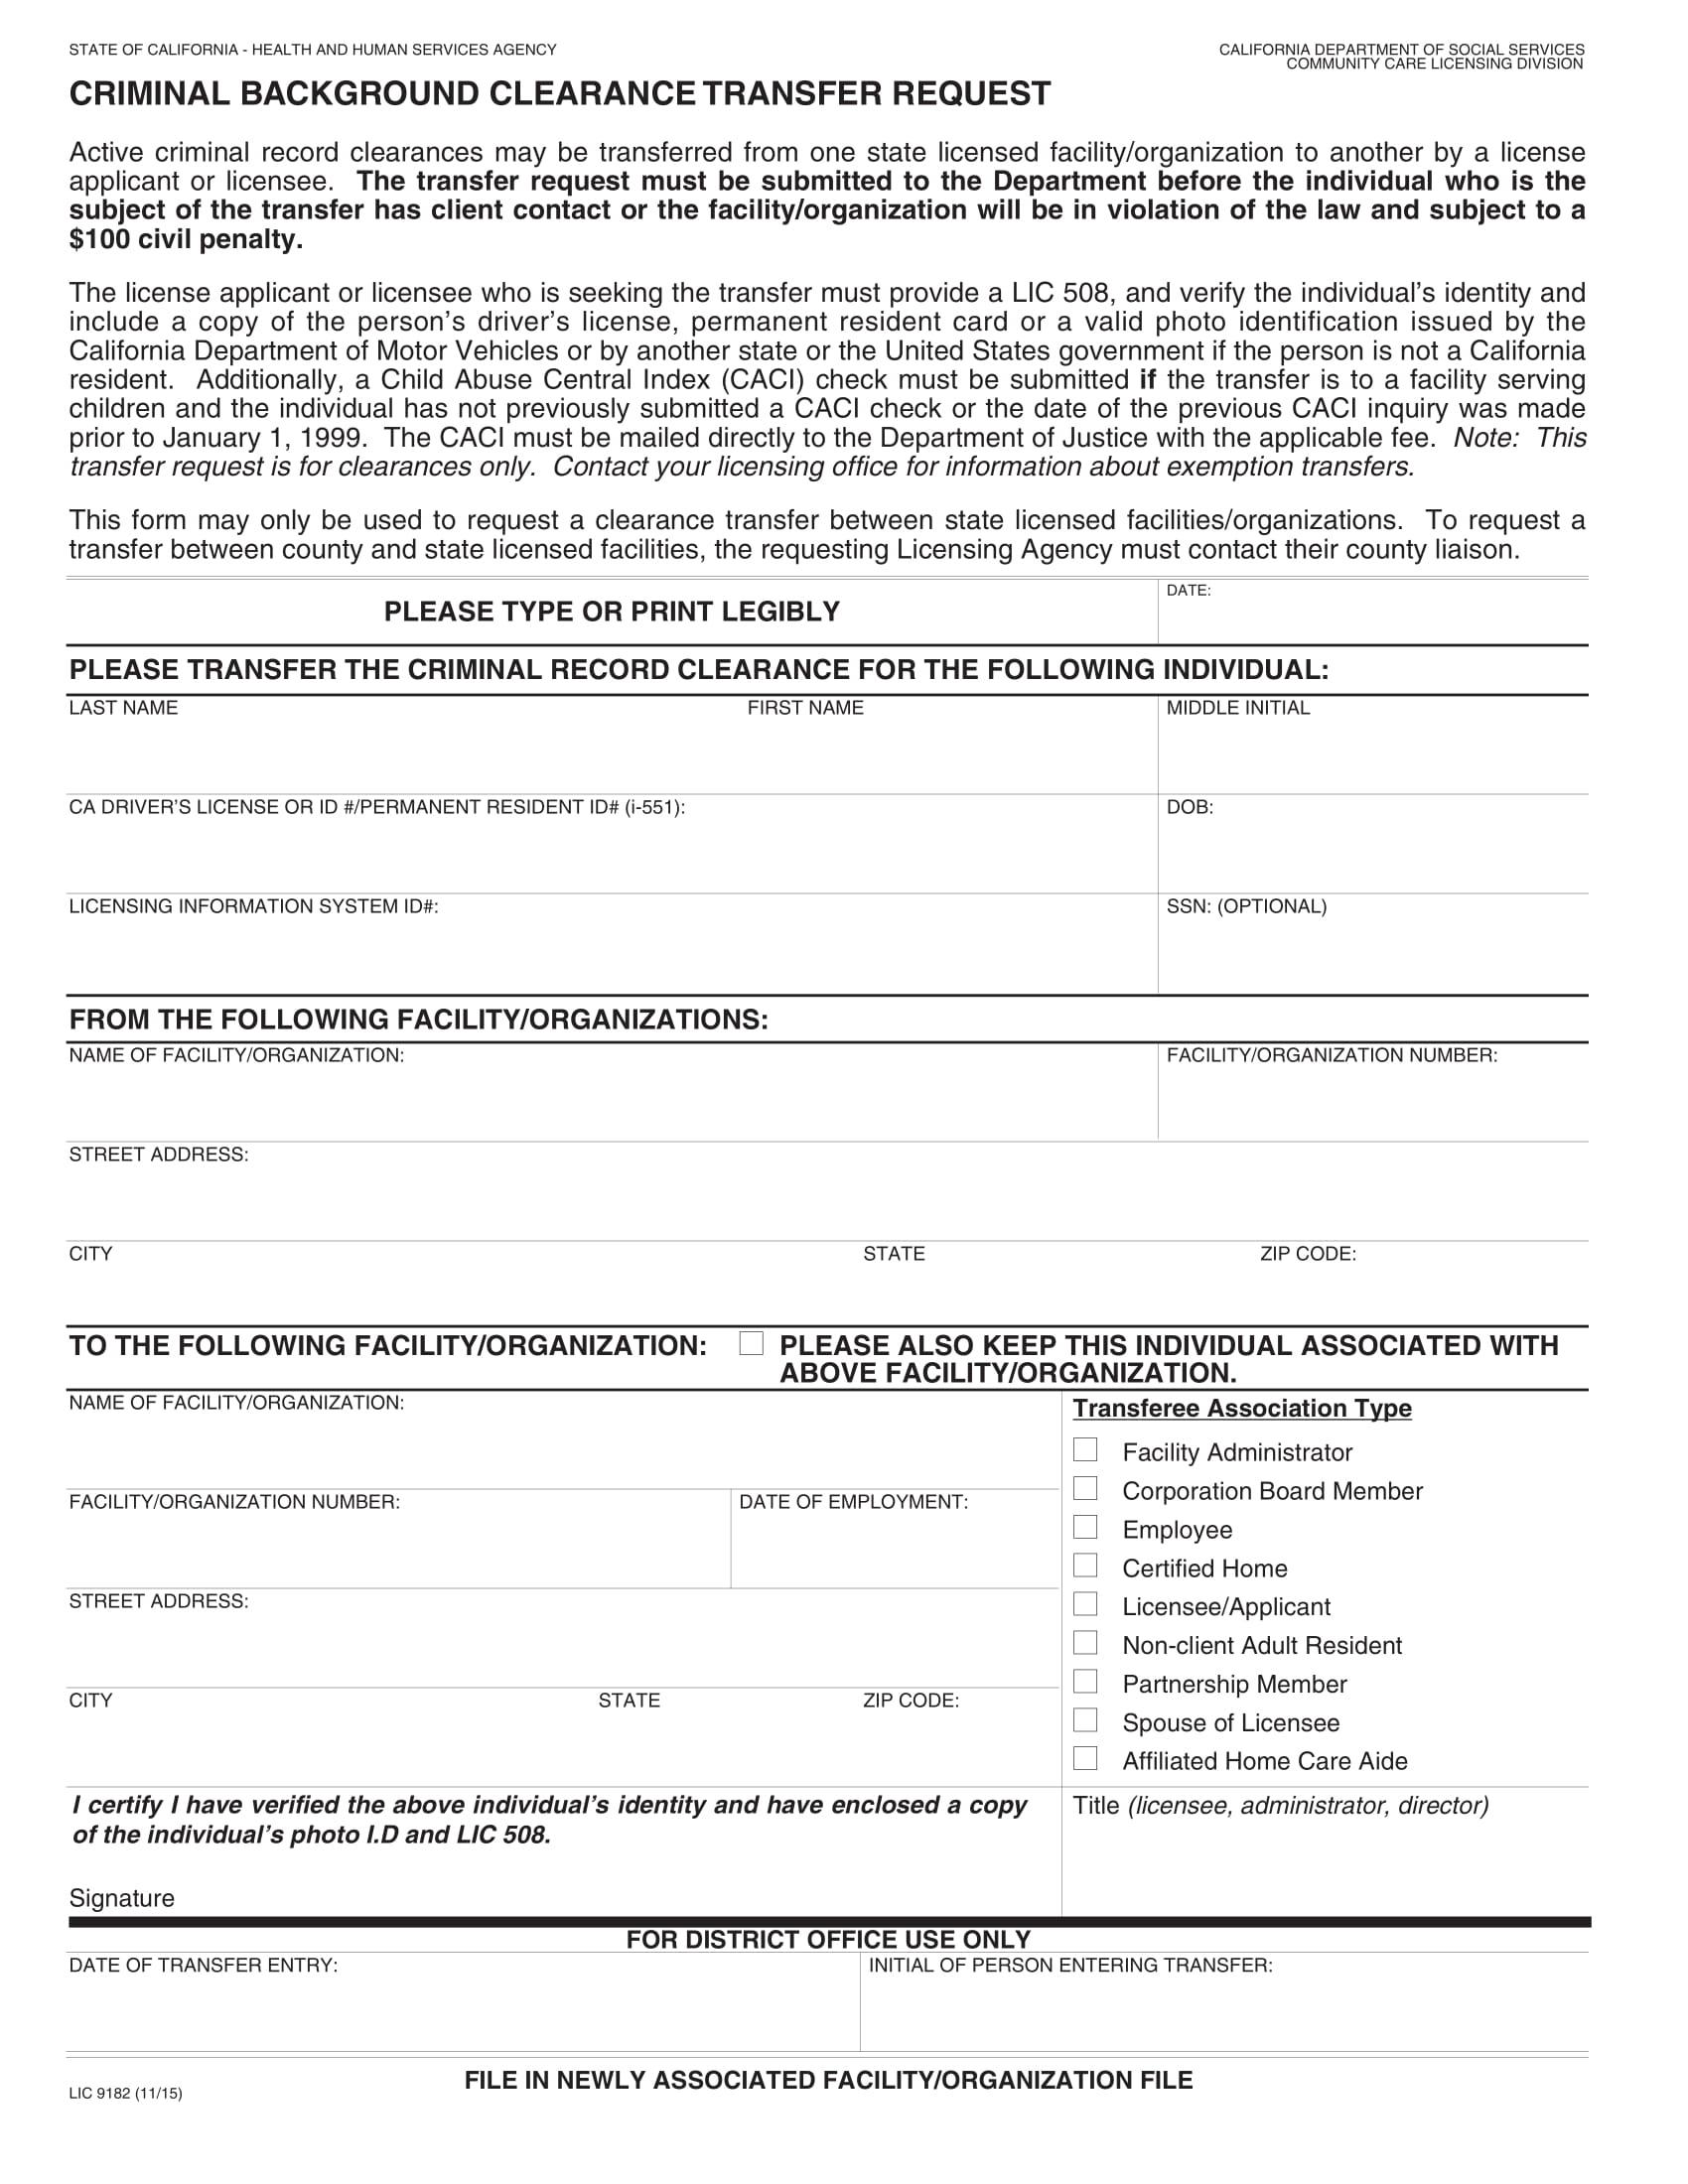 criminal background clearance form 1